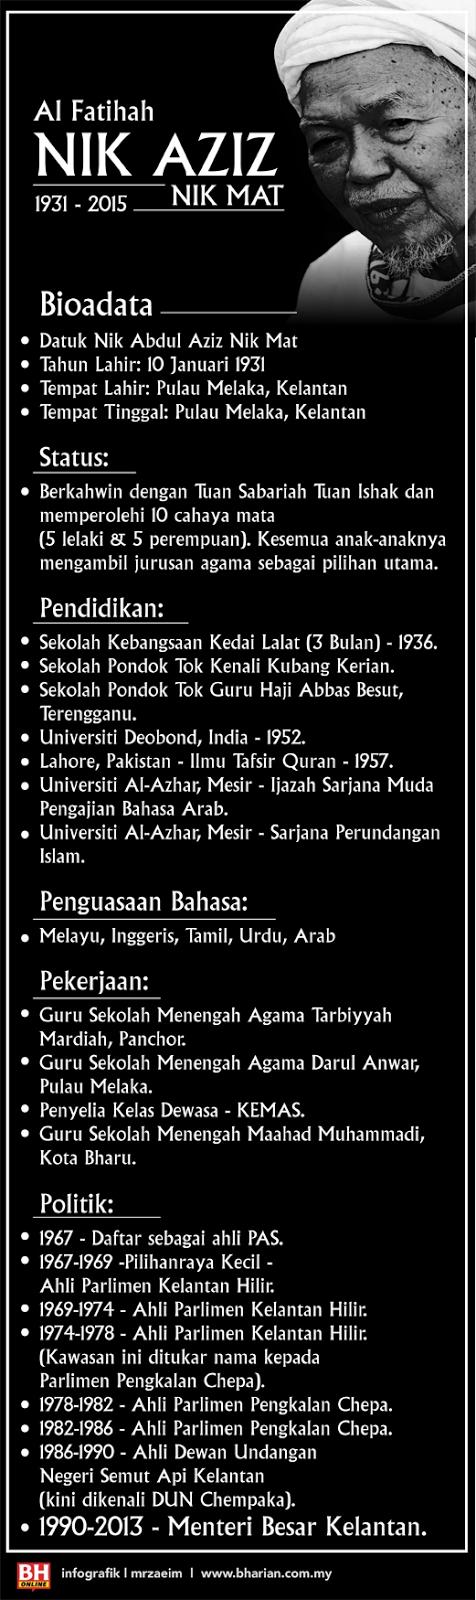 Biodata Allahyarham Tuan Guru Nik Aziz Nik Mat